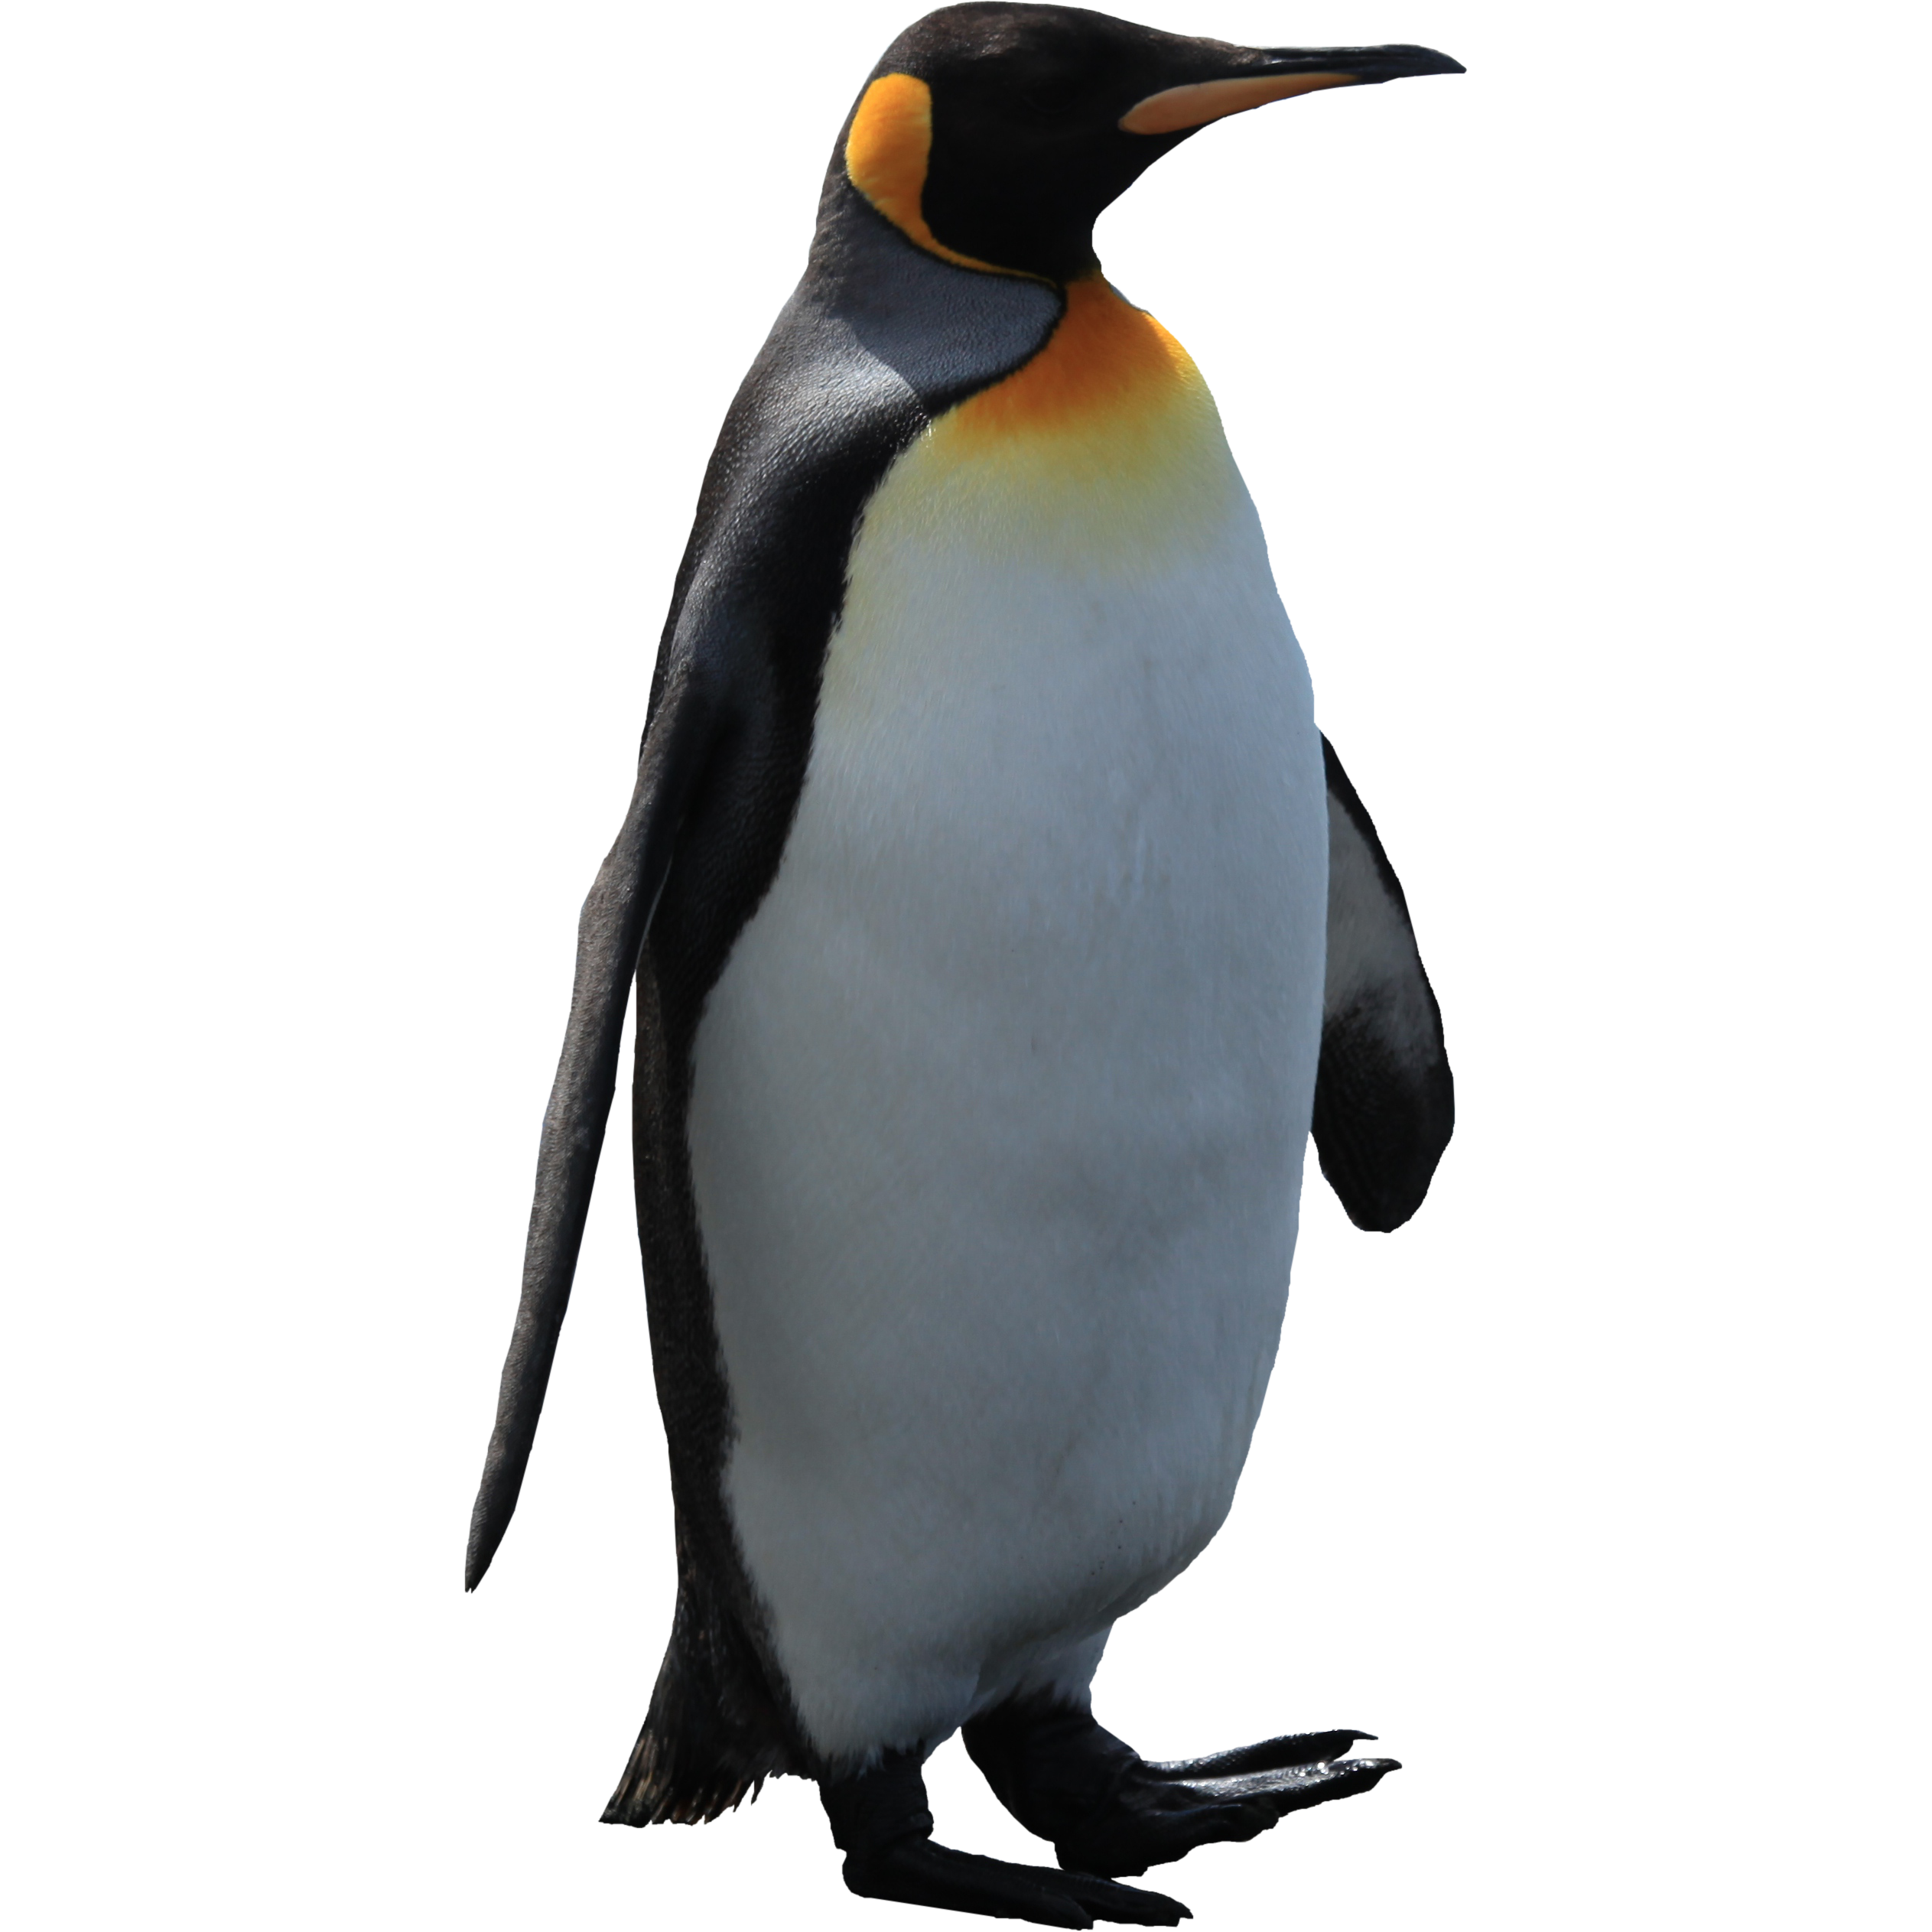 Hd png transparent images. Clipart penquin galapagos penguin